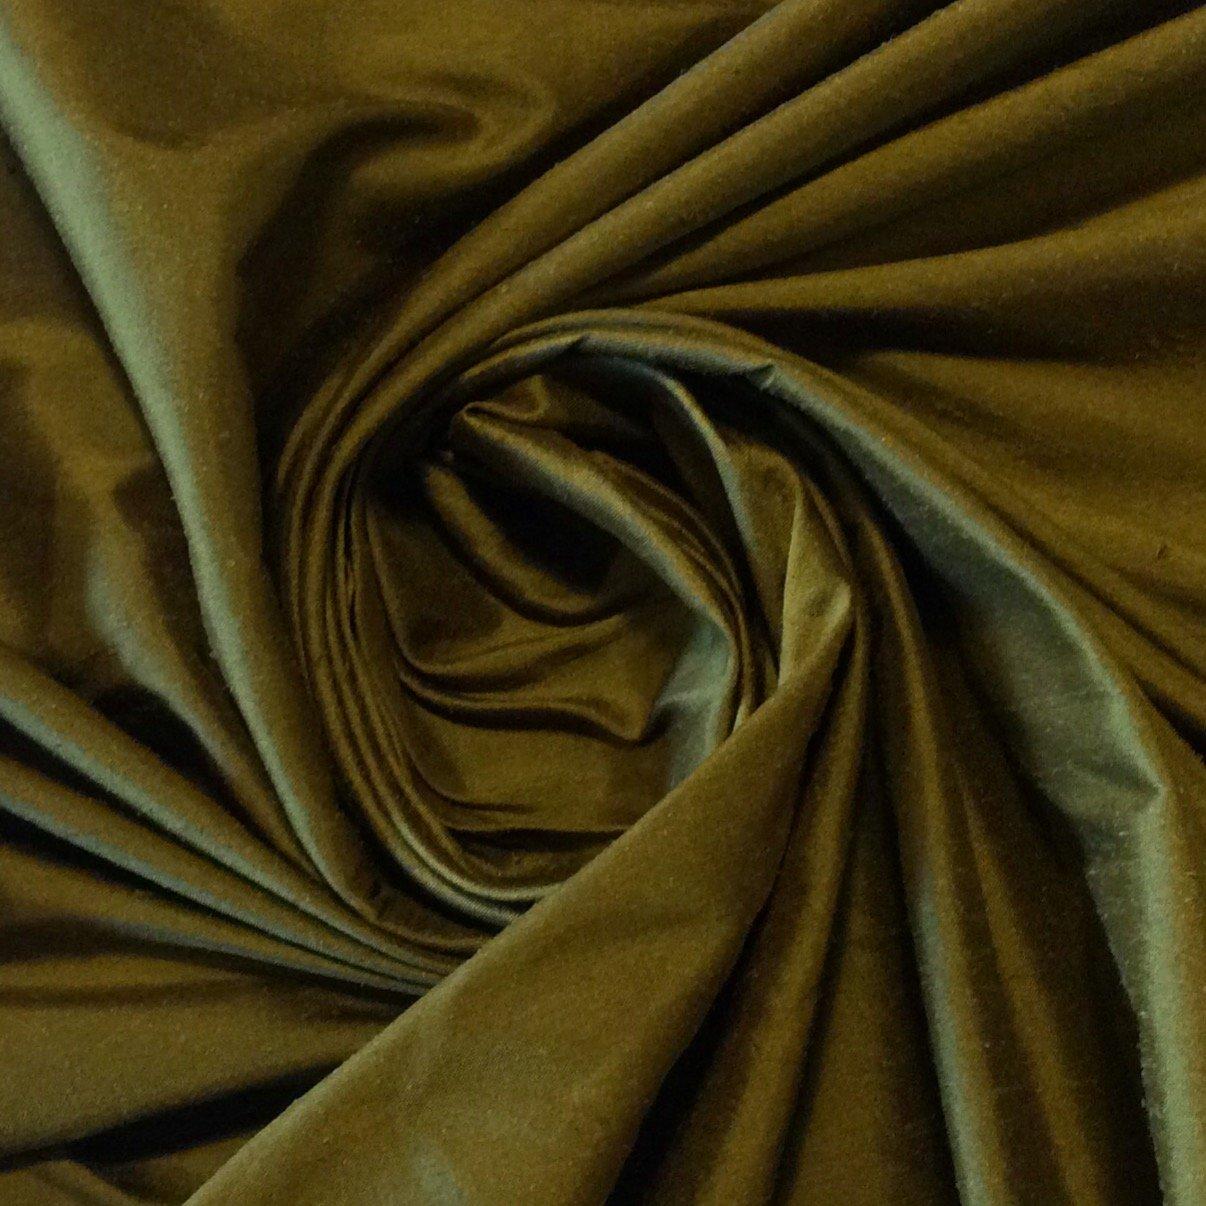 SM06 Olive Green Rich Dupioni Shantung 100% Silk Fabric Drapery Costume Fabric